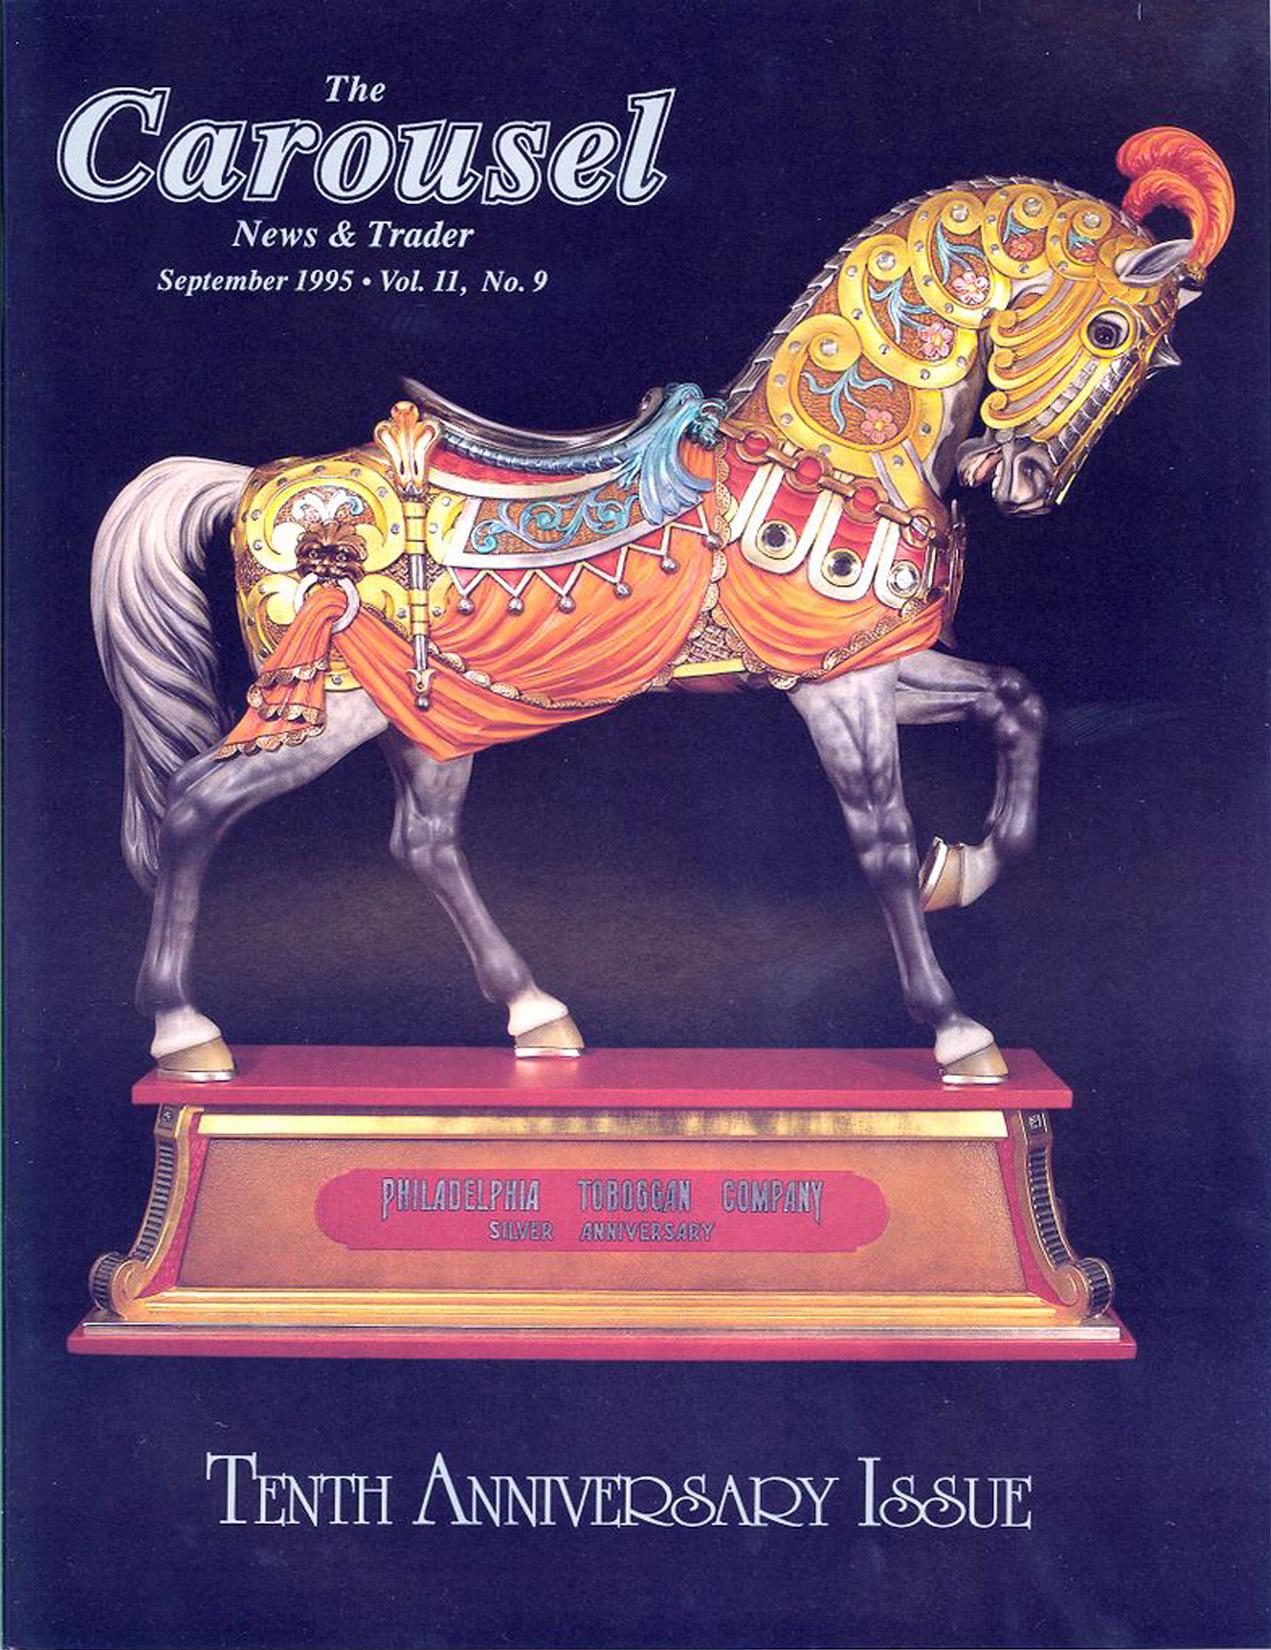 cnt_09_1995-Frank-Caretta-PTC-Silver-Anniversary-horse